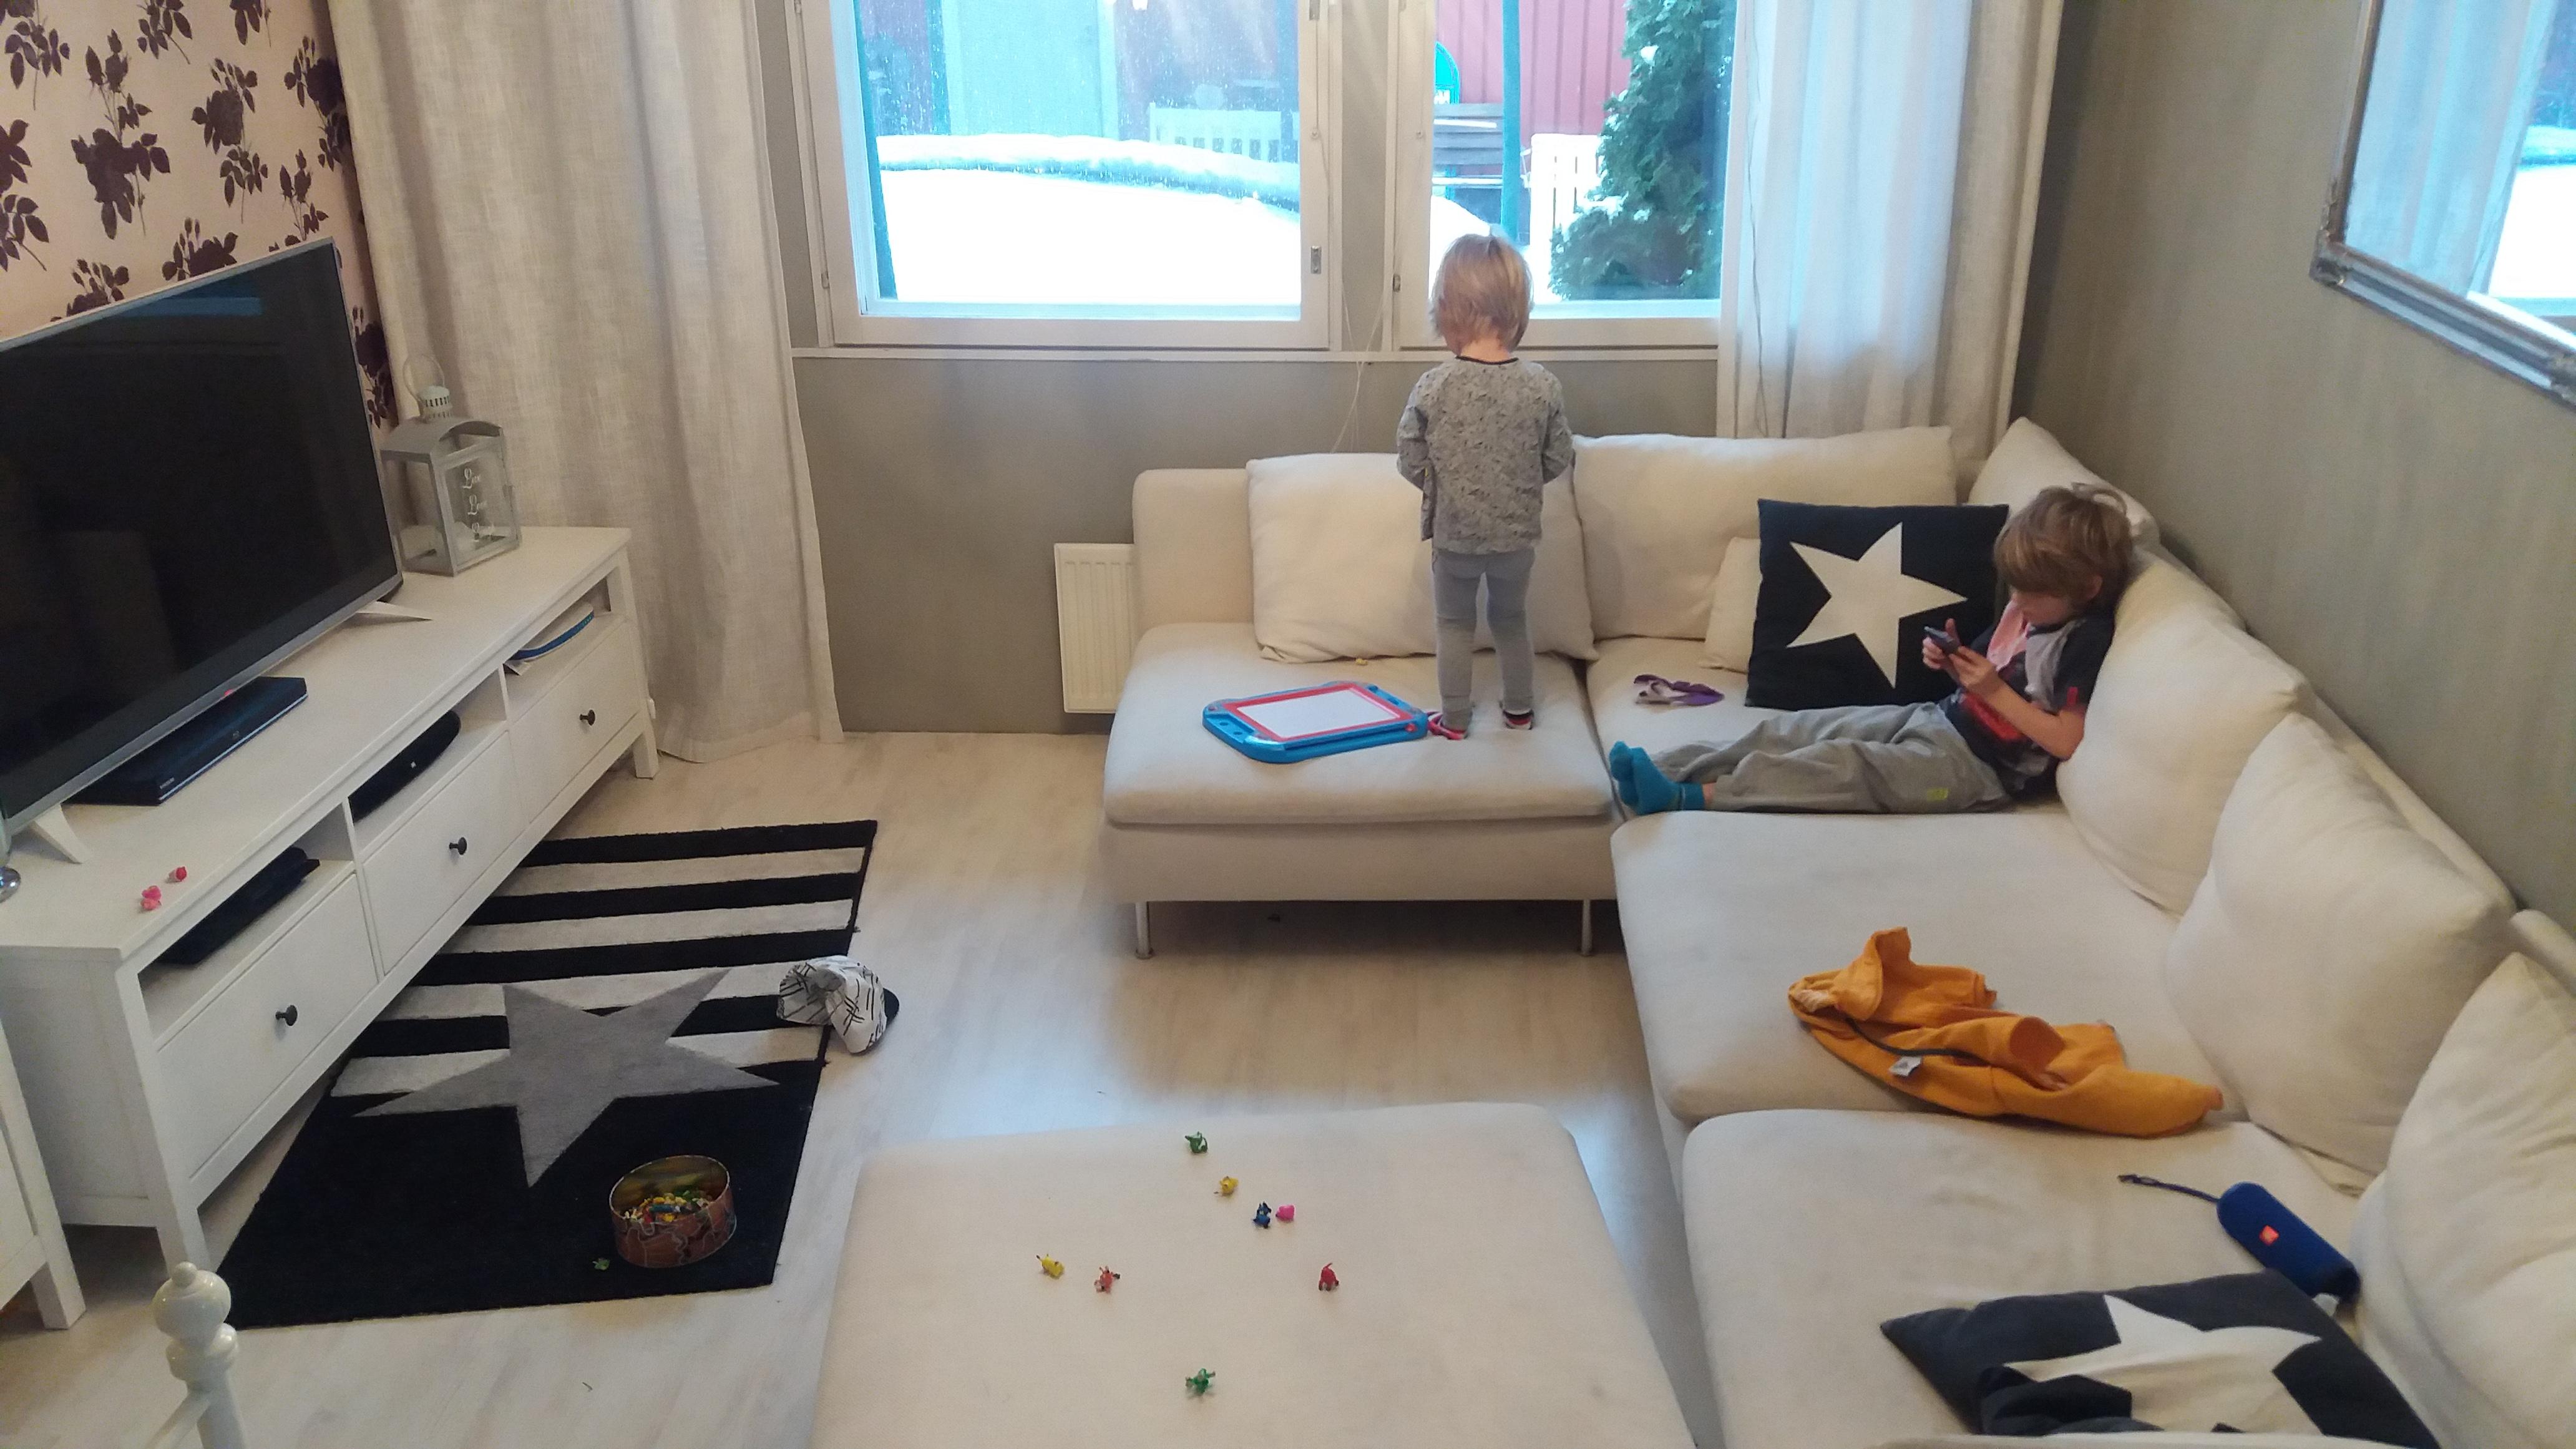 lapsiperheen olohuone